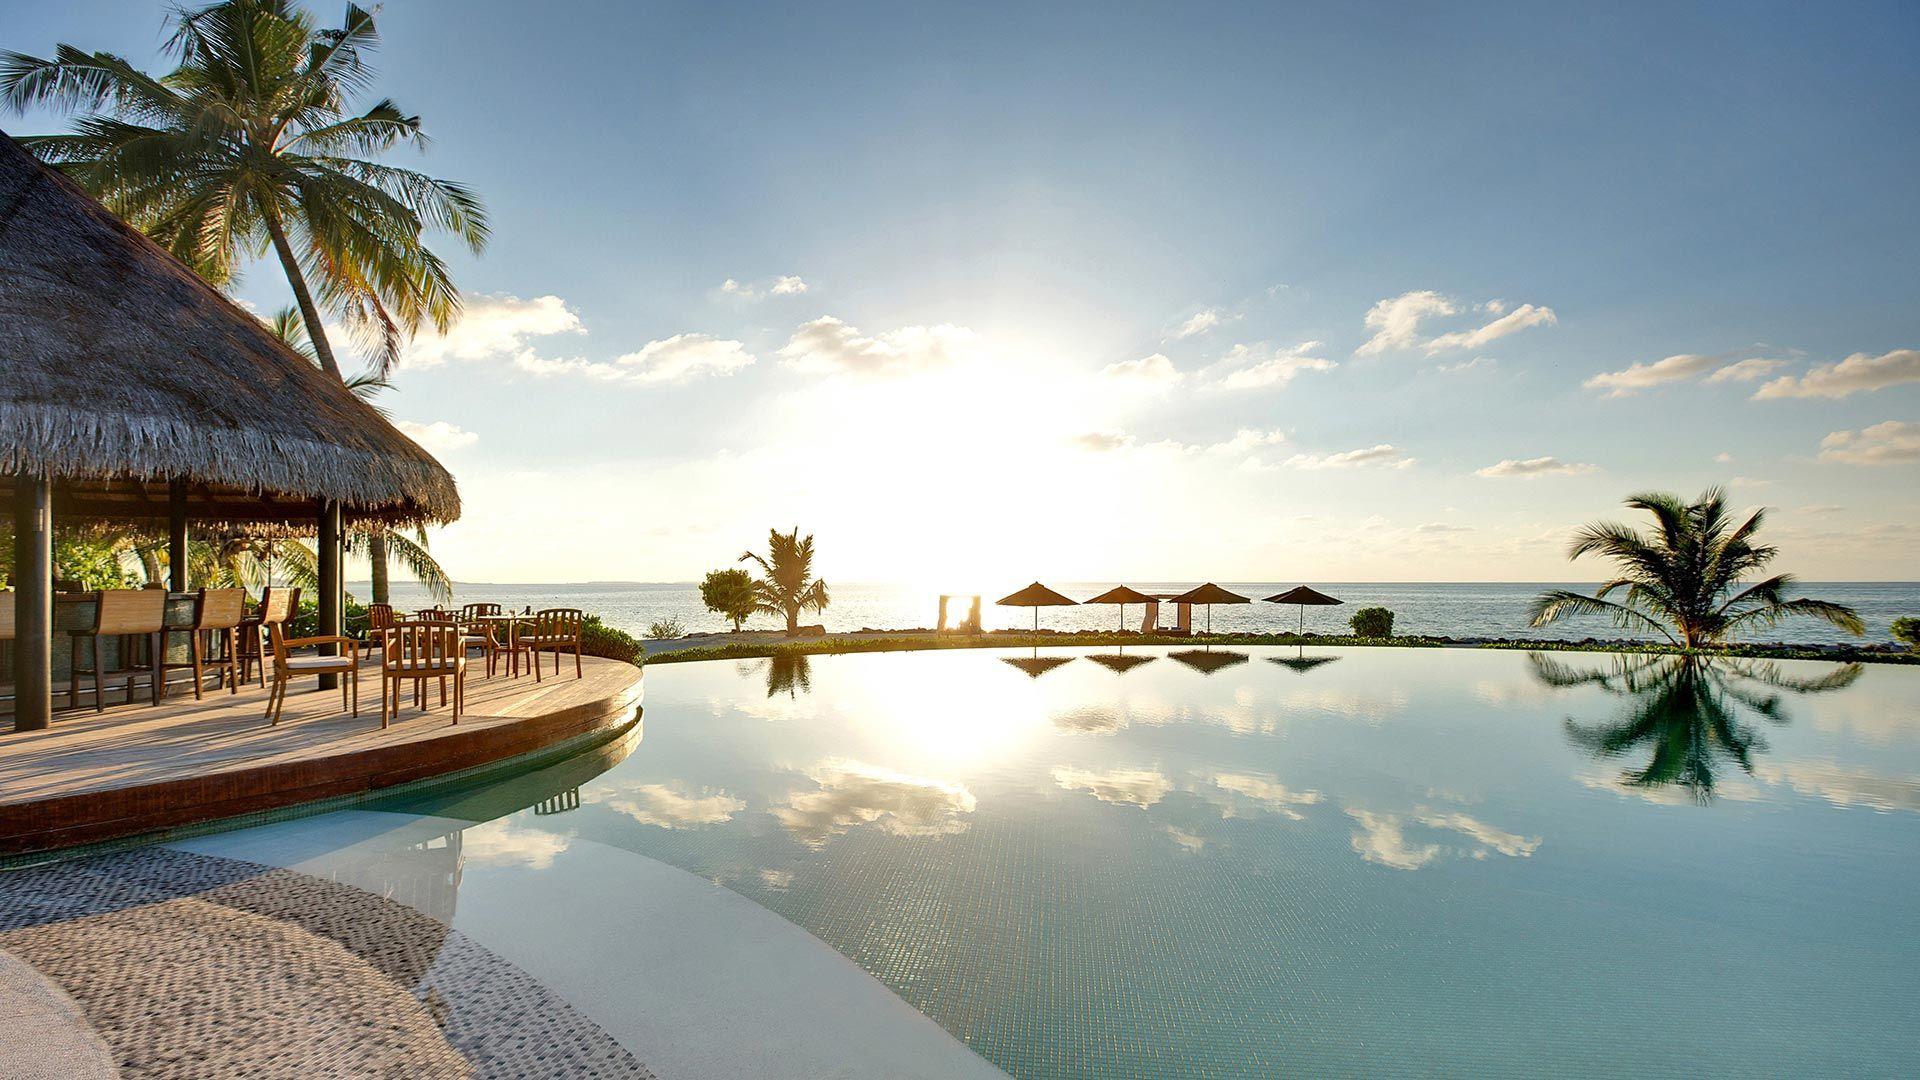 Maldives Resorts (5*), Maldives Hotels, Hotel Maldives ...